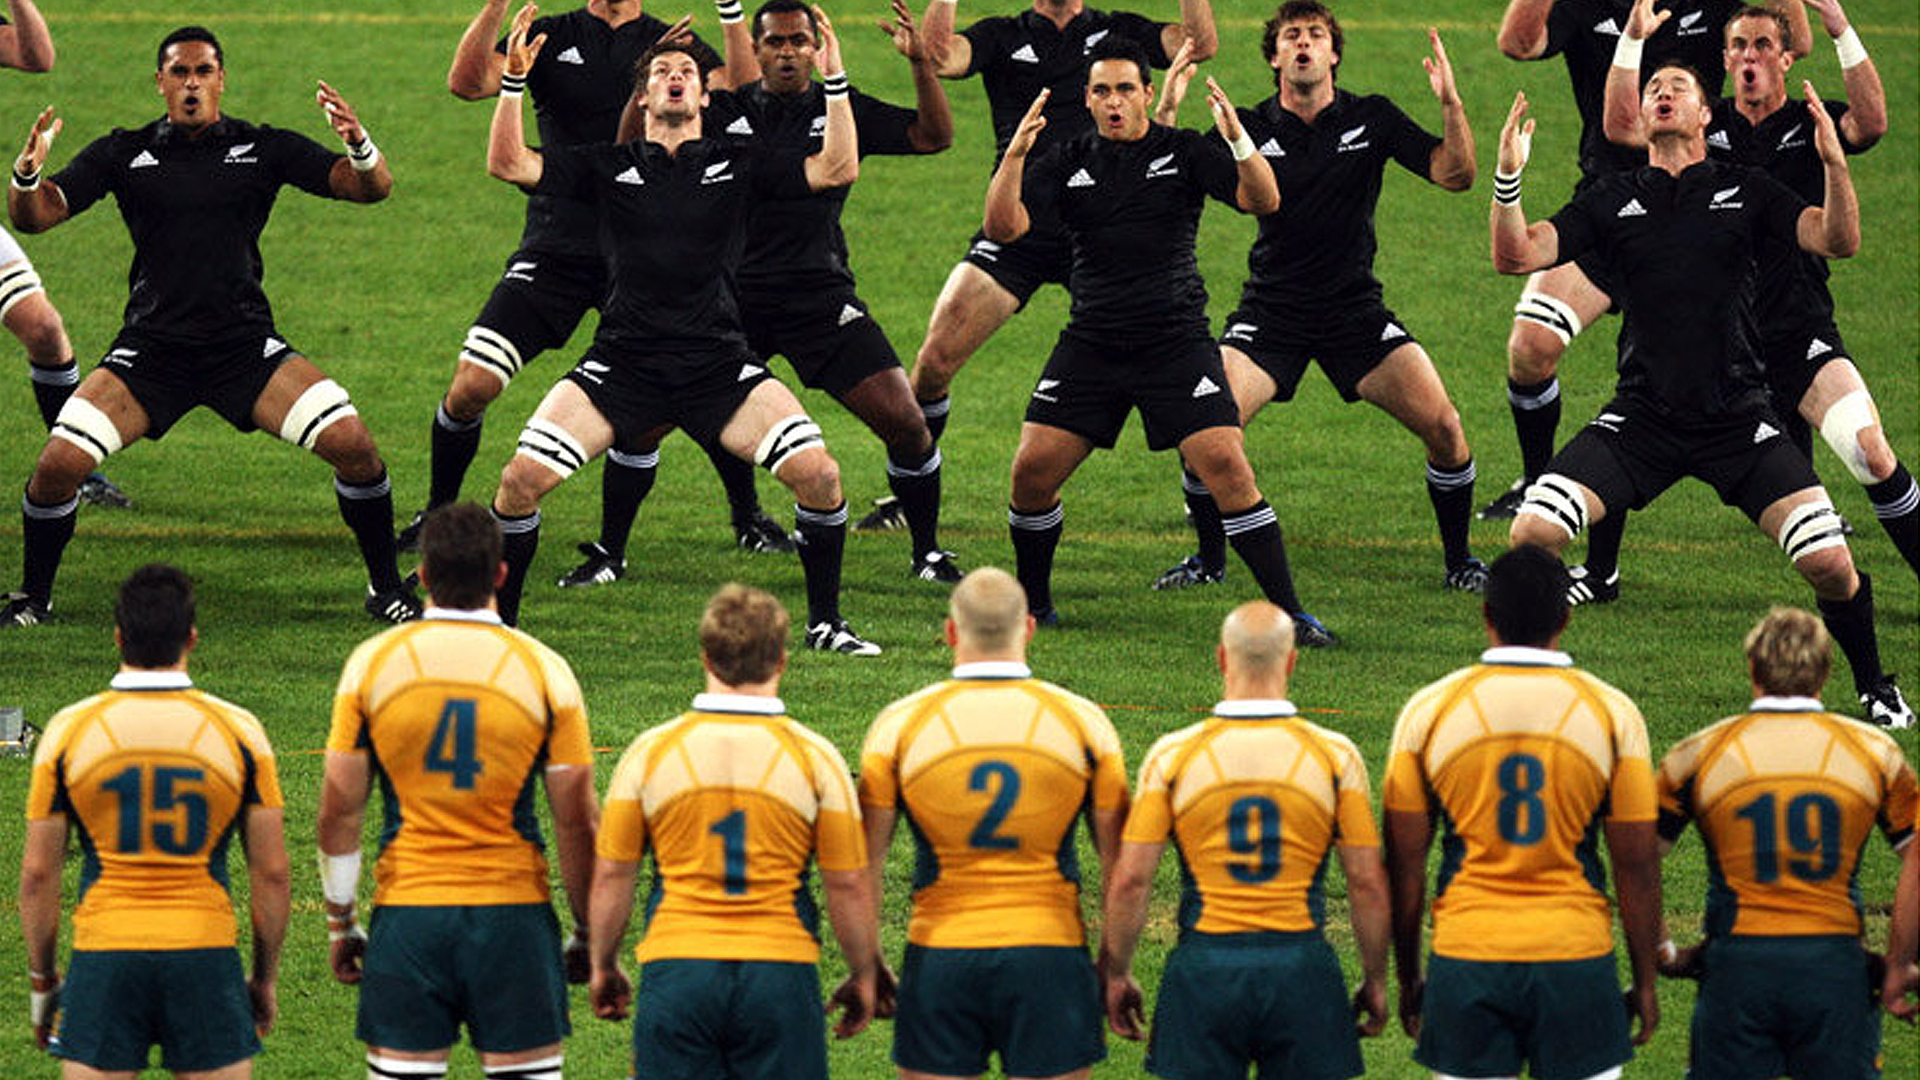 Australia Vs New Zealand Bledisloe 3 Currie Cup Preview The Profits